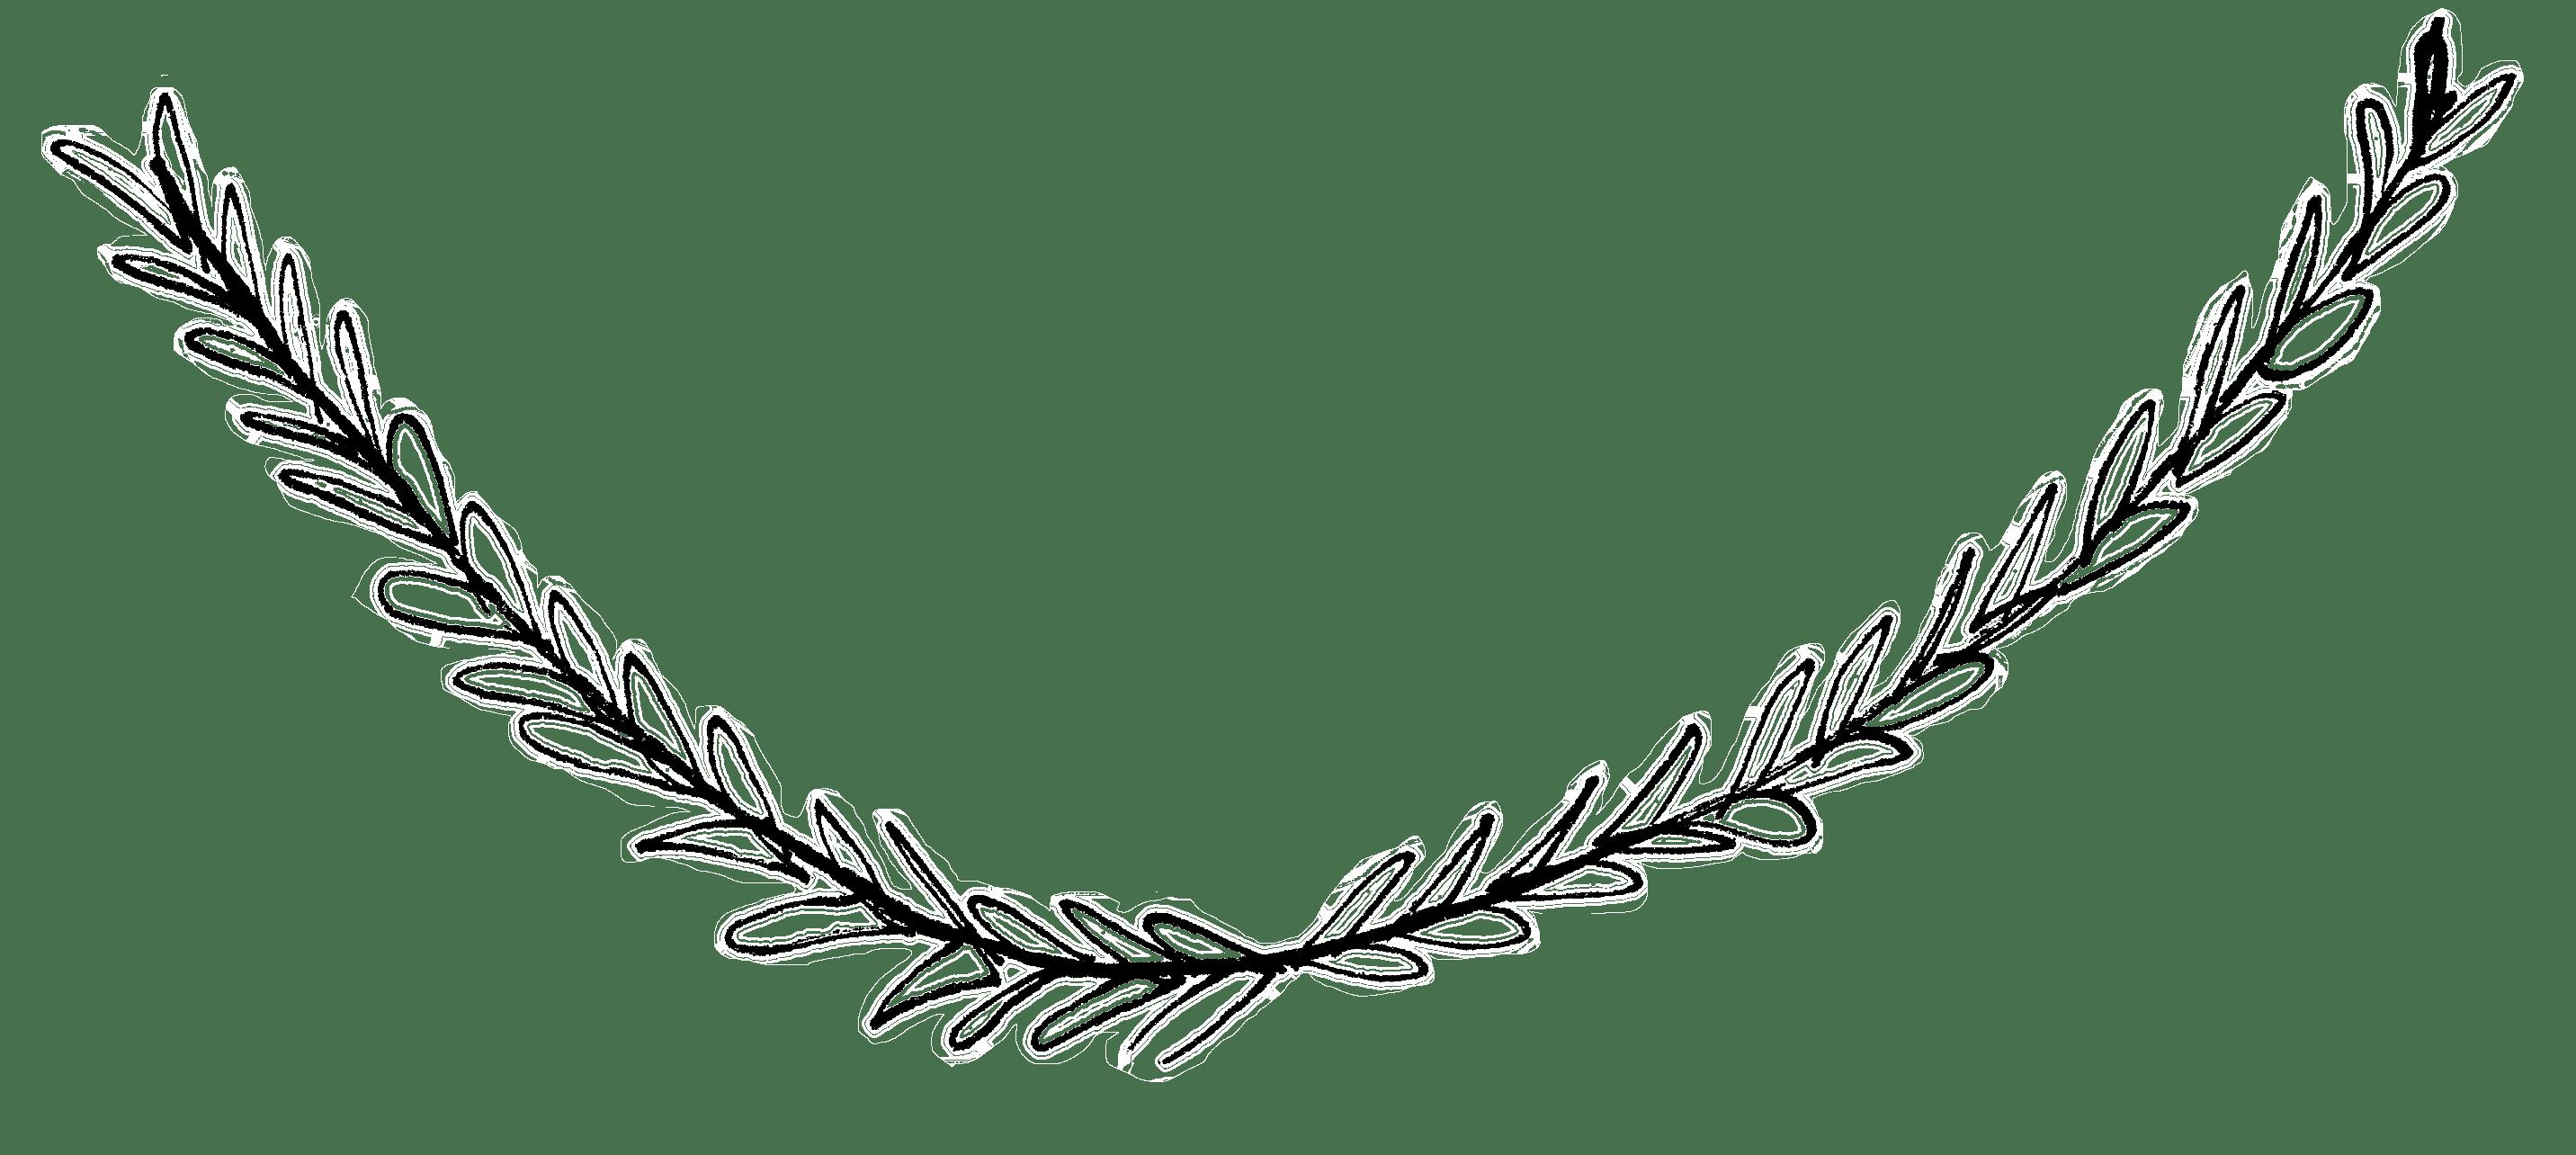 Free hand drawn clip. Flourish clipart heart